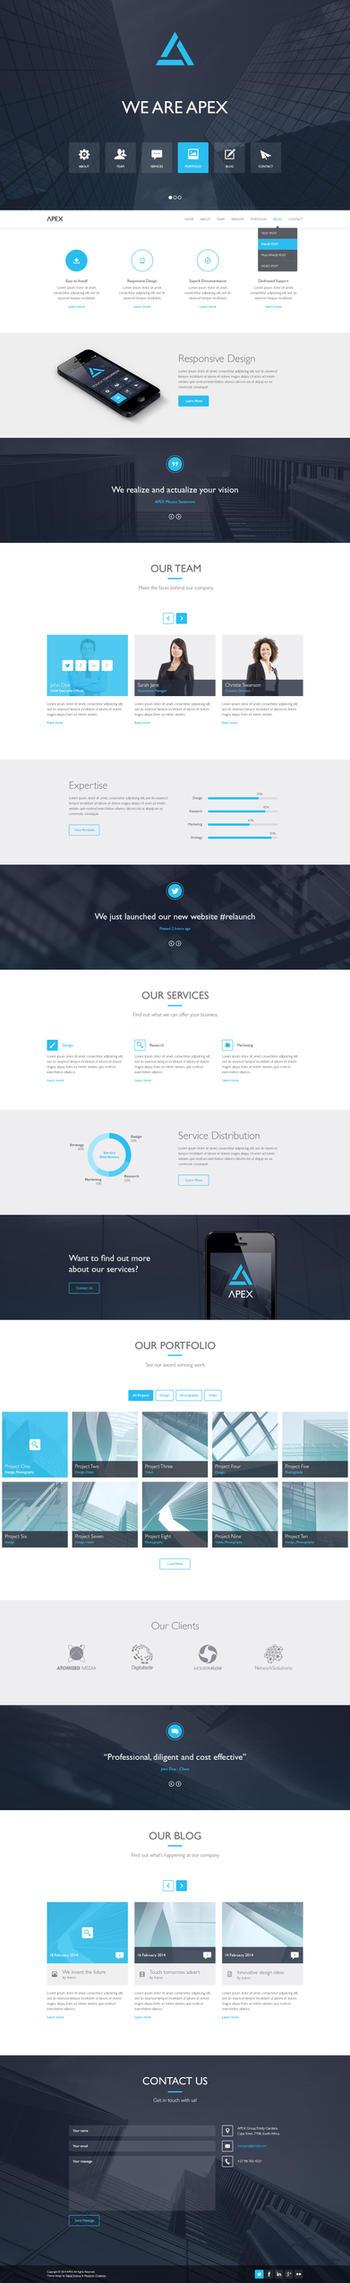 Apex Responsive WordPress Theme by wpthemes